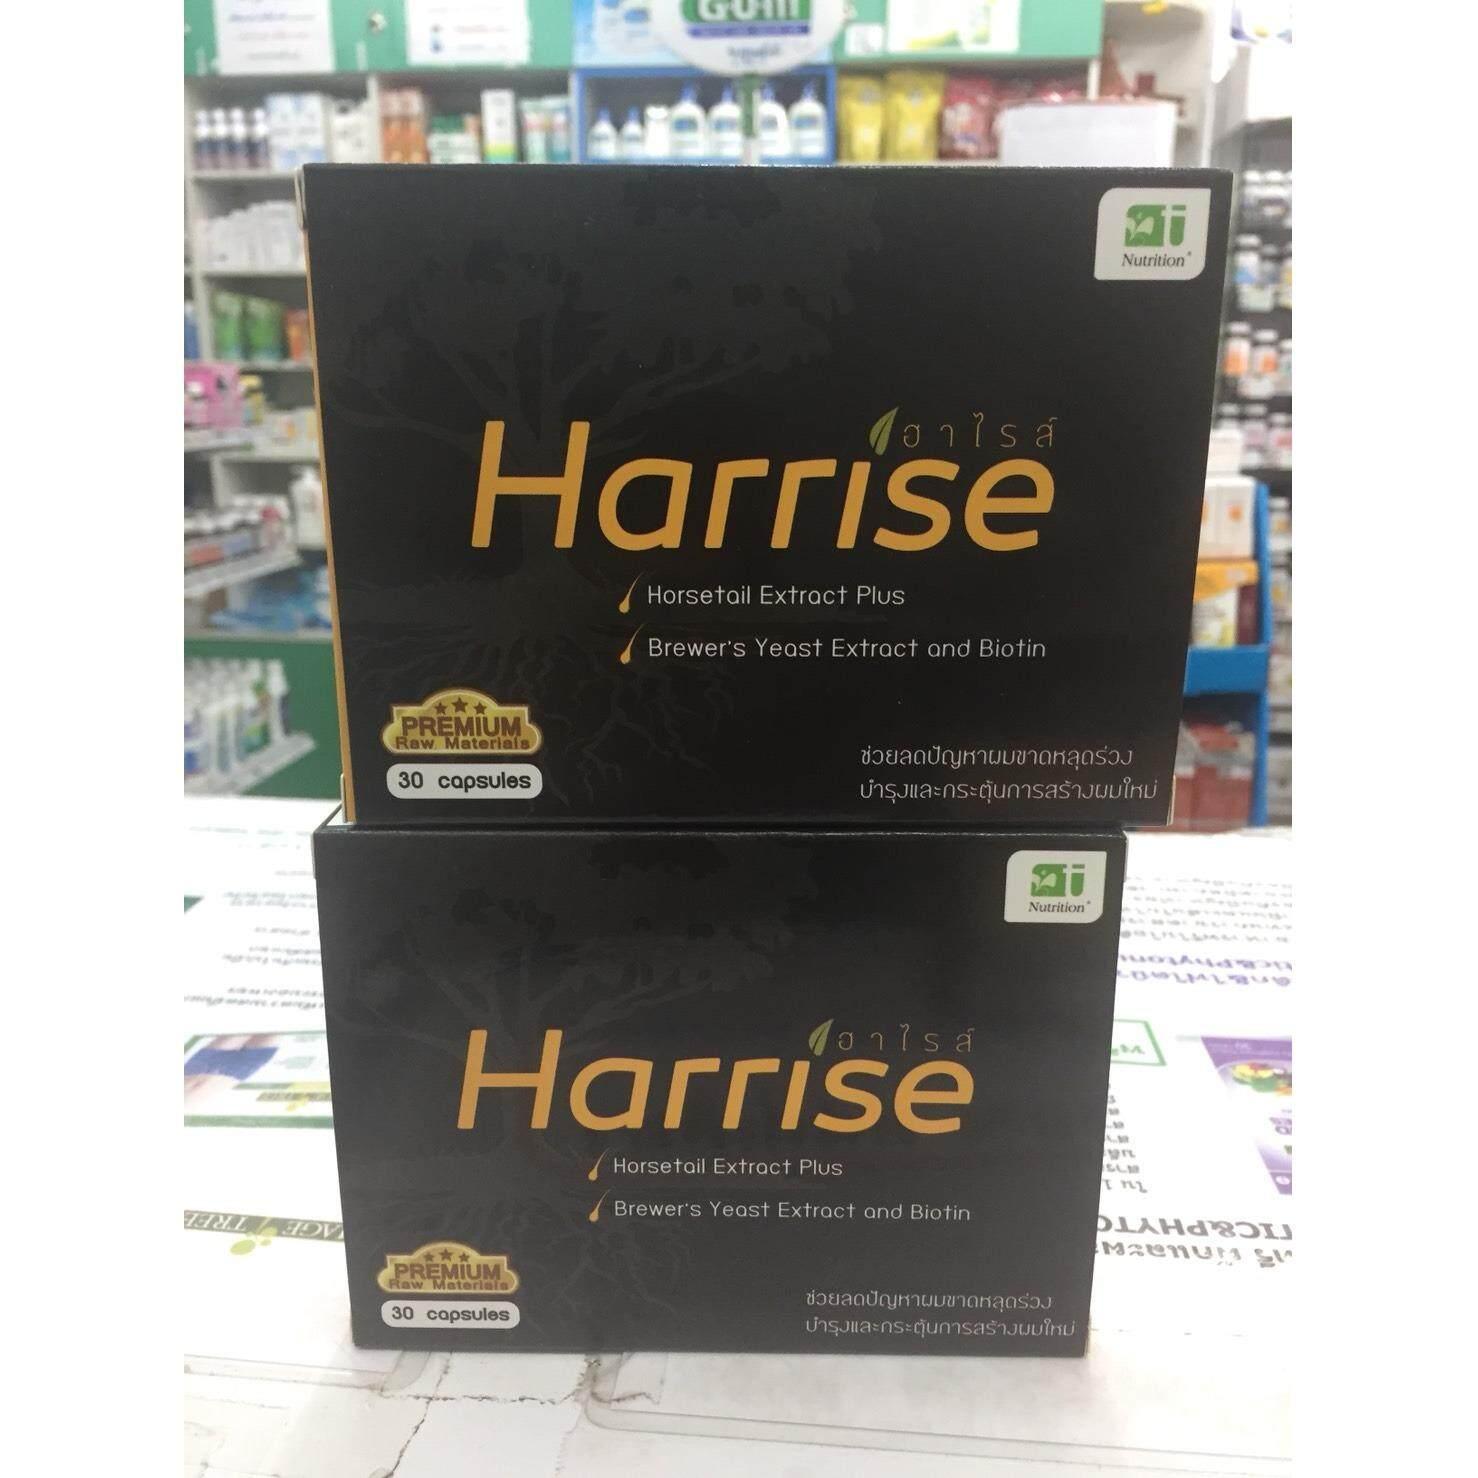 Harrise 30 แคปซูล * 2 กล่อง บำรุงเส้นผมให้หนา รักษาผมร่วง